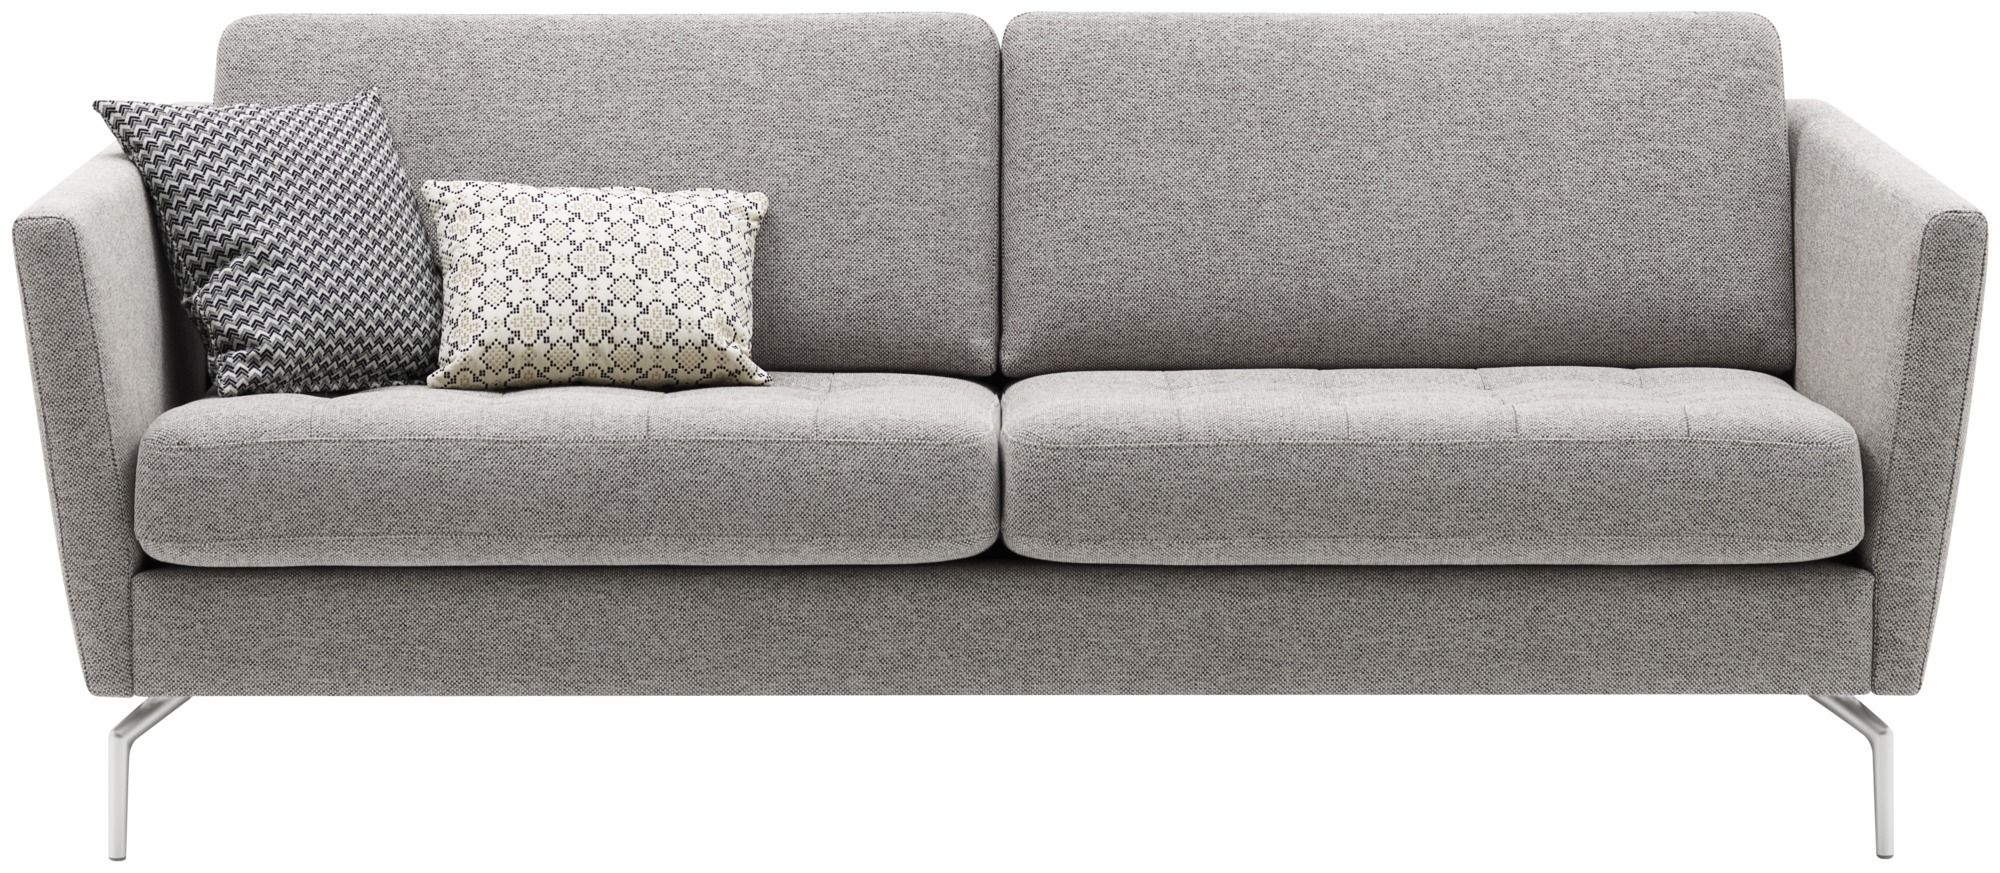 2 5 Seater Sofas Osaka Sofa Tufted Seat Modern Sofa Living Room Boconcept Modern Sofa Designs